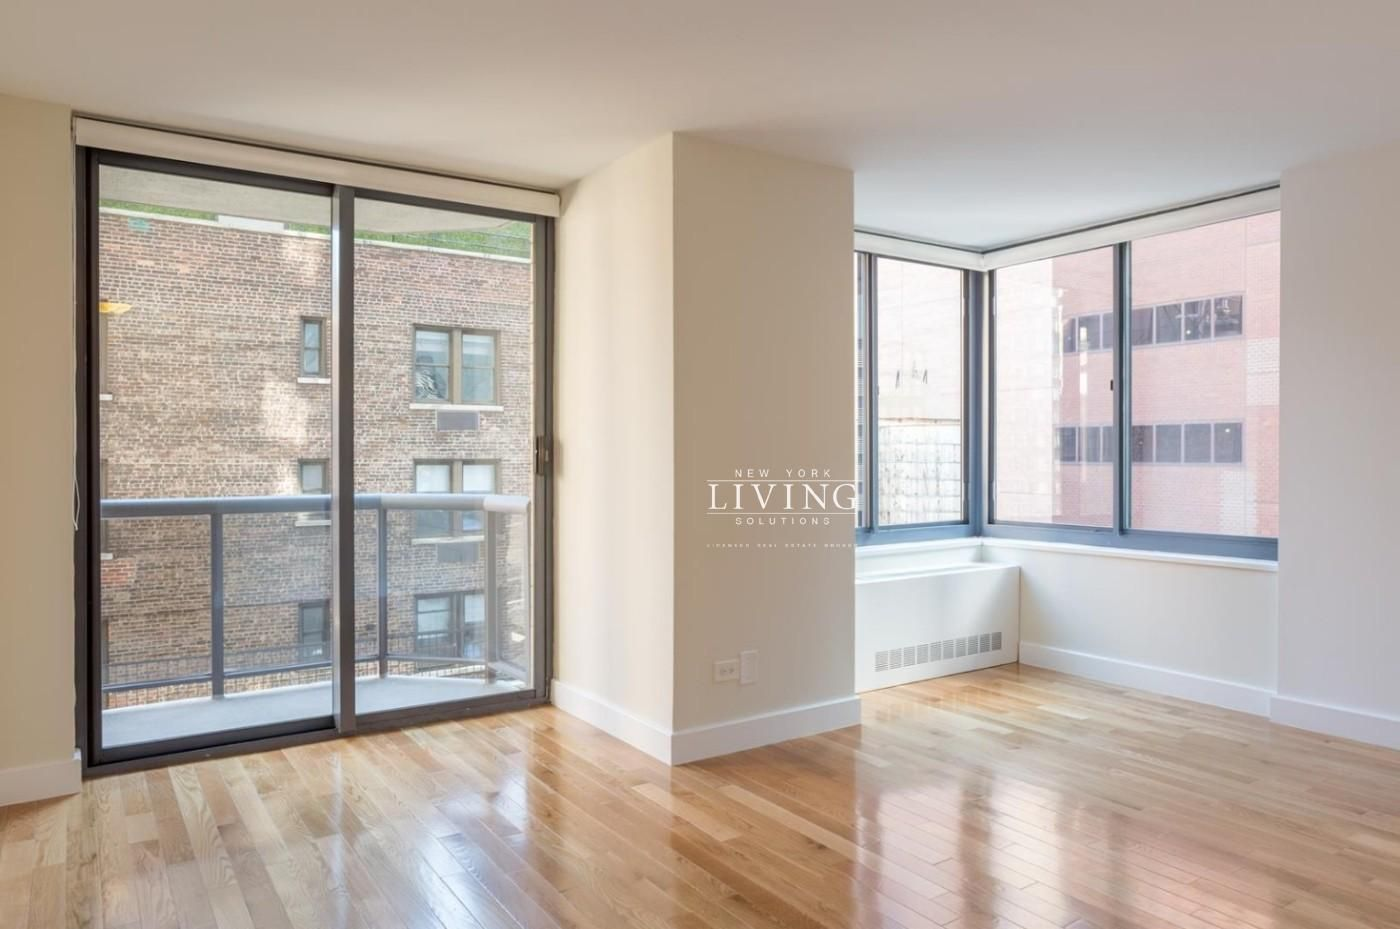 1 Bedroom 1 Bathroom Apartment for Sale in Midtown West